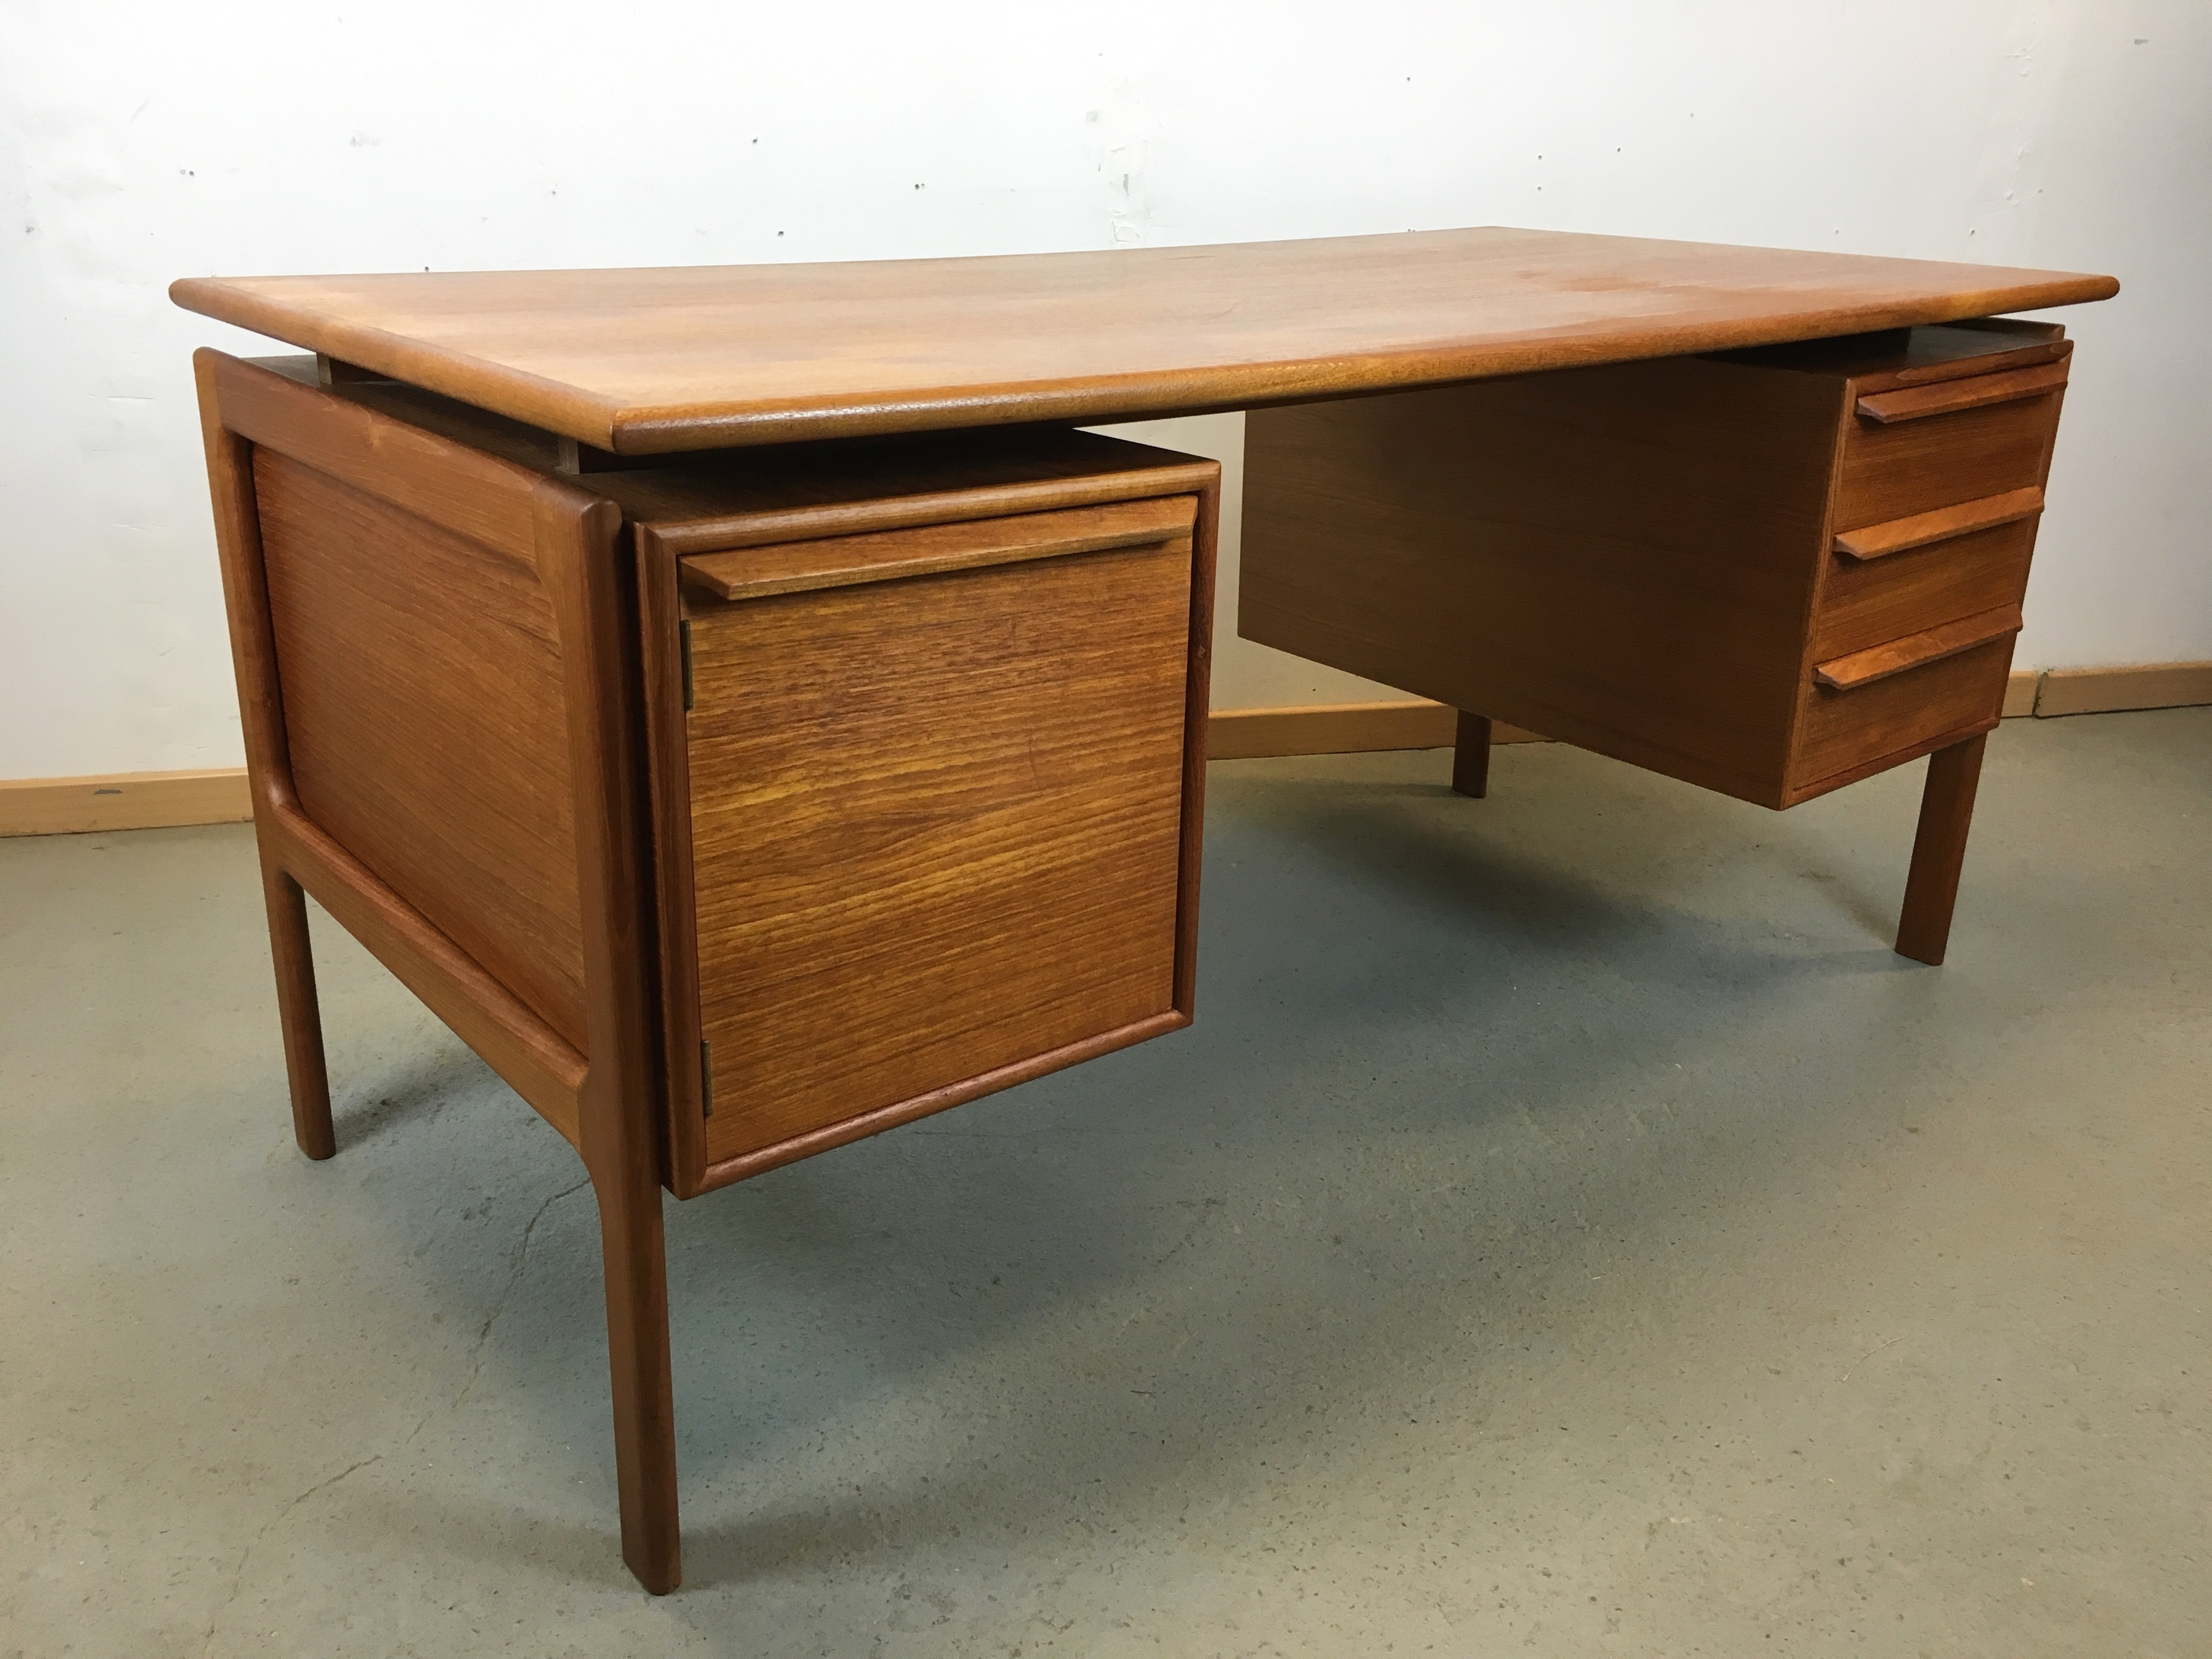 bureau scandinave annee 70 desk danish peter lovig